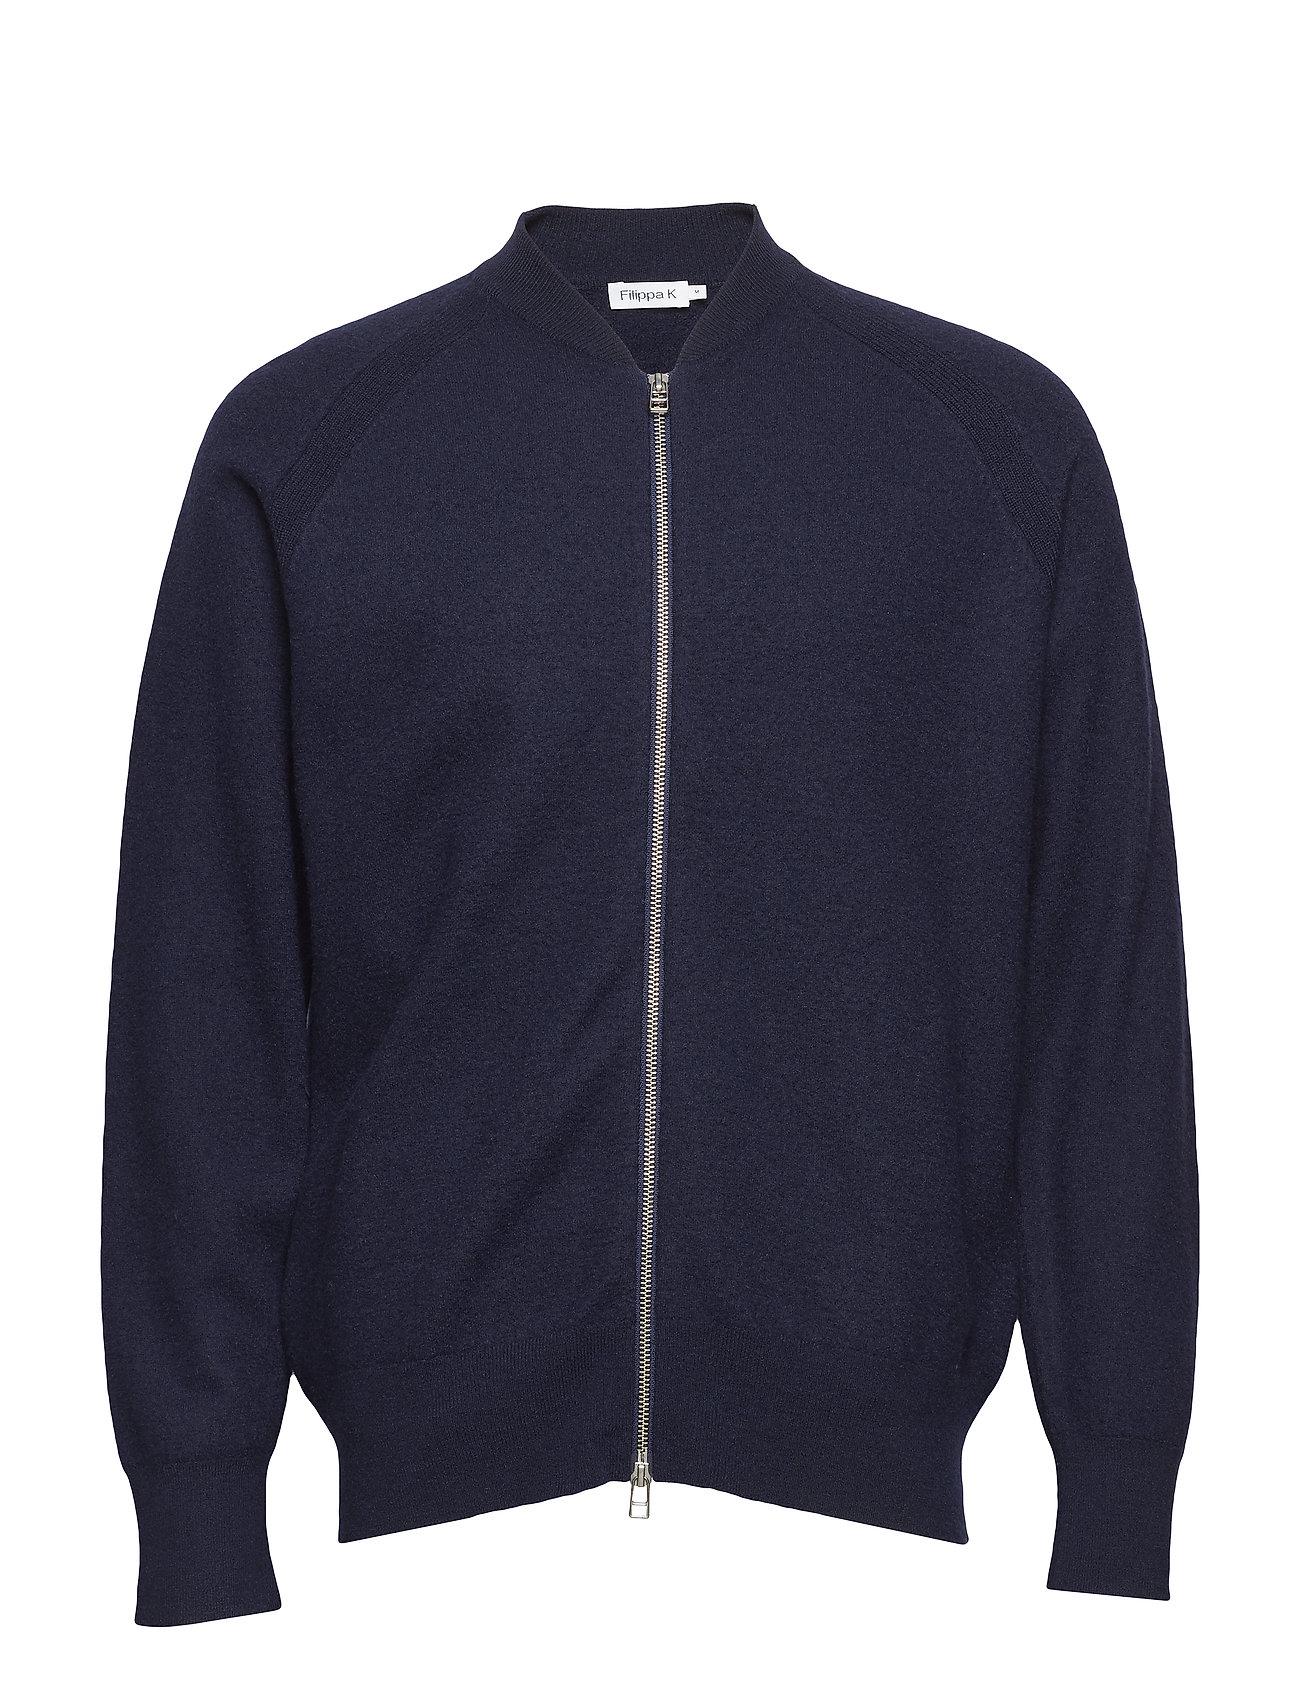 Filippa K M. Boiled Wool Zip Jacket 459589278